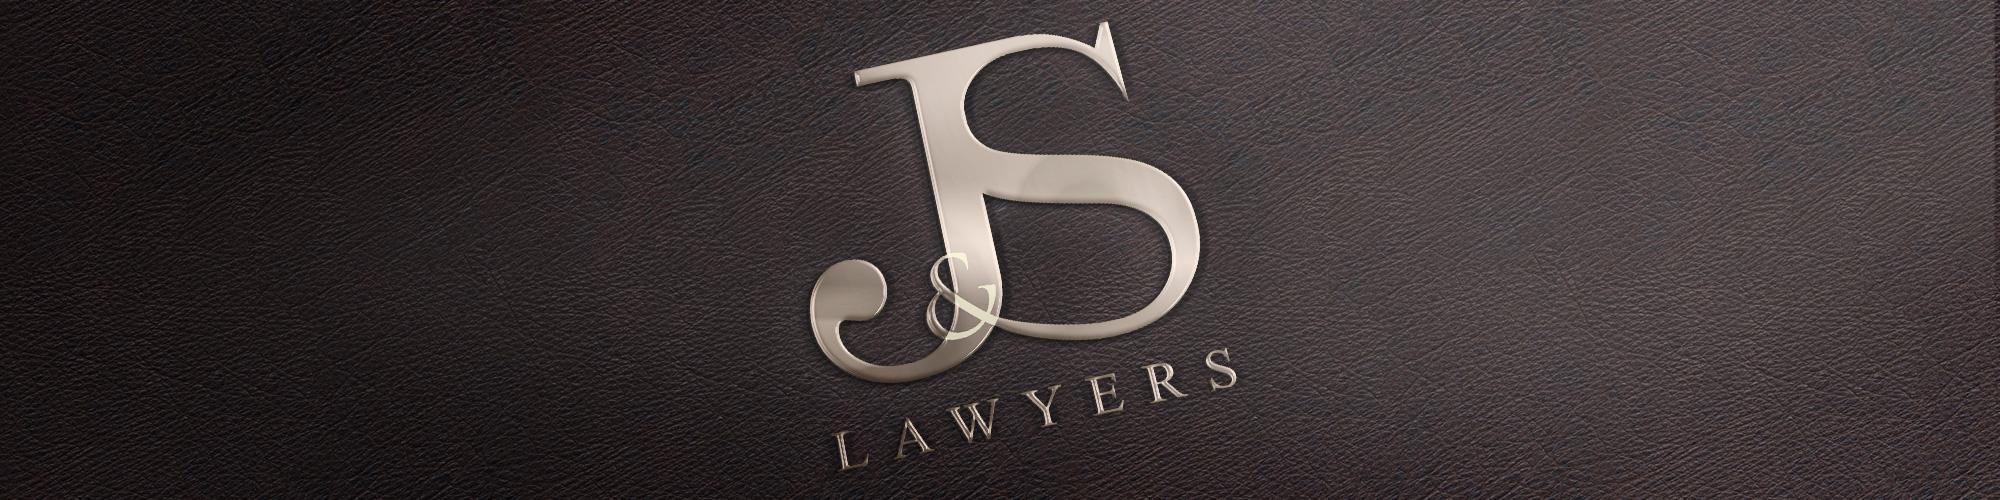 js-lawers-logo